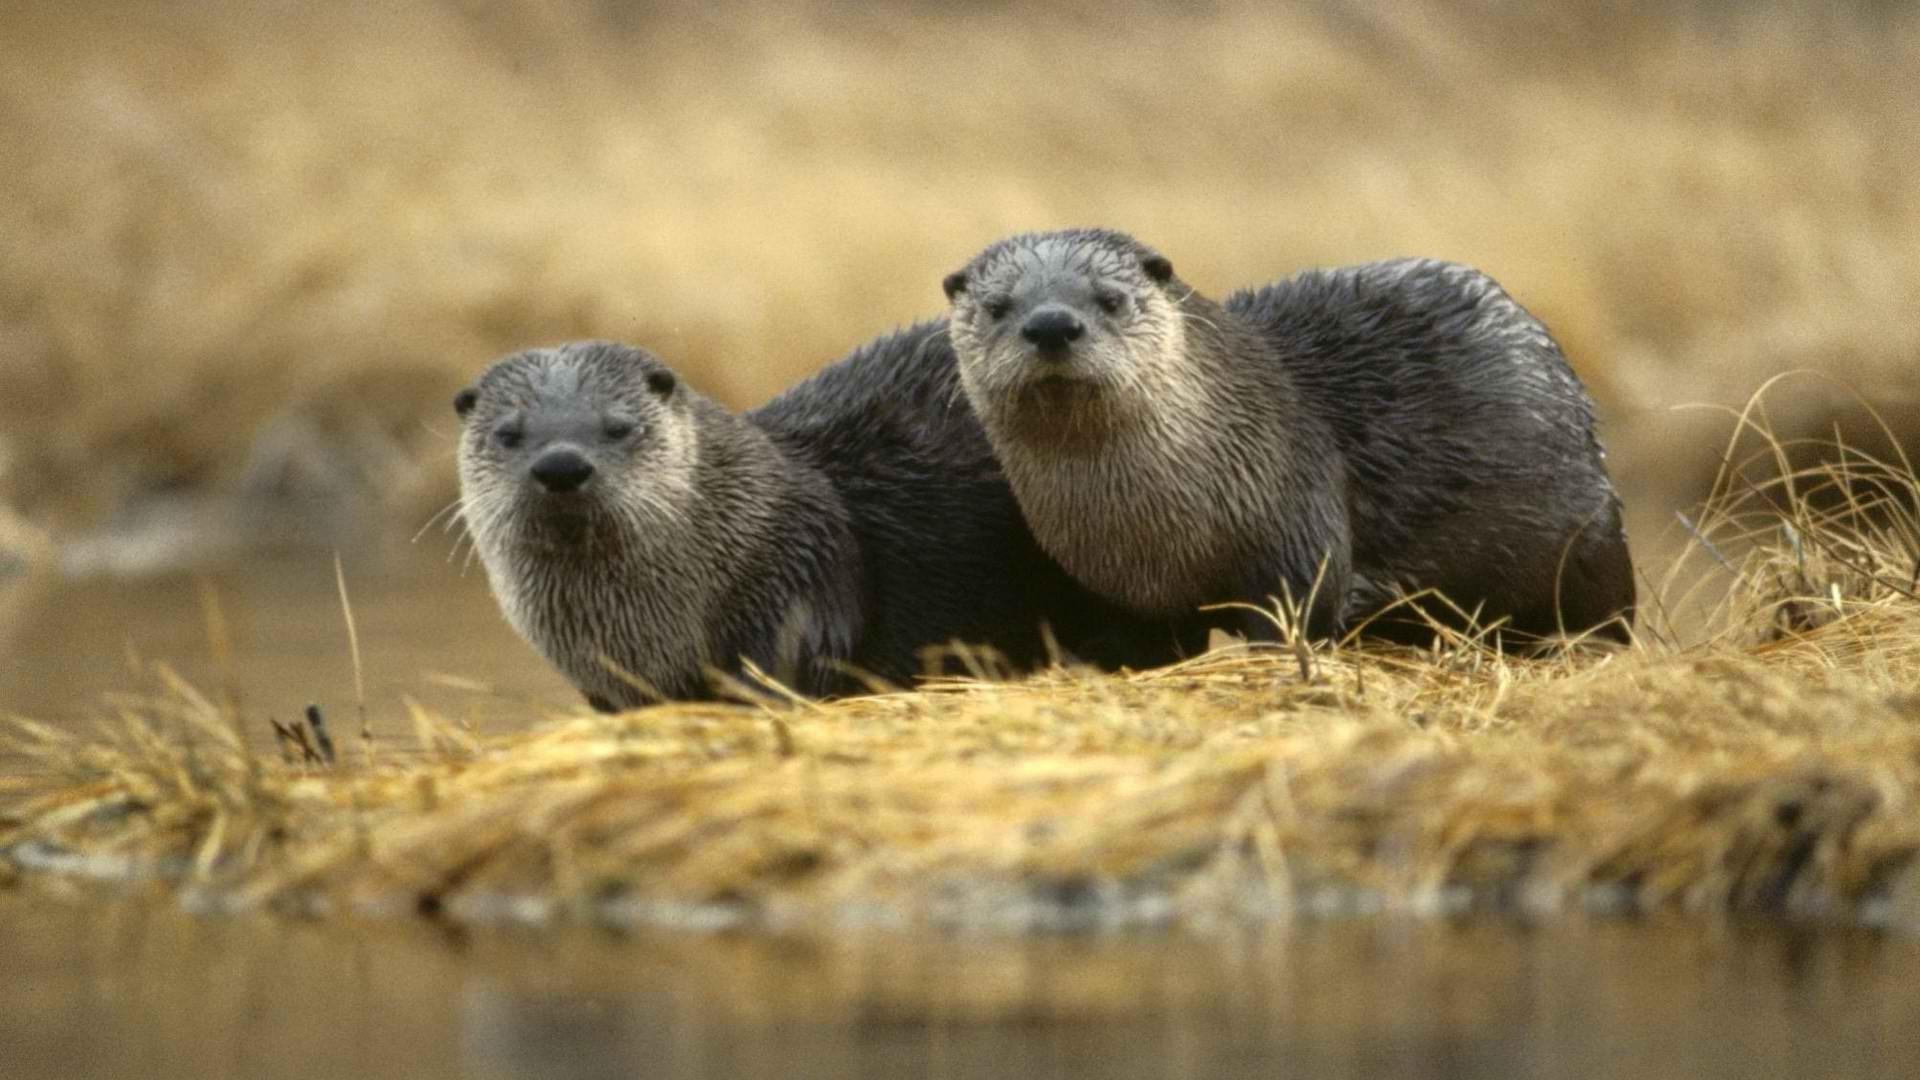 Wallpaper Animals Nature Wildlife Otters Fauna Mammal